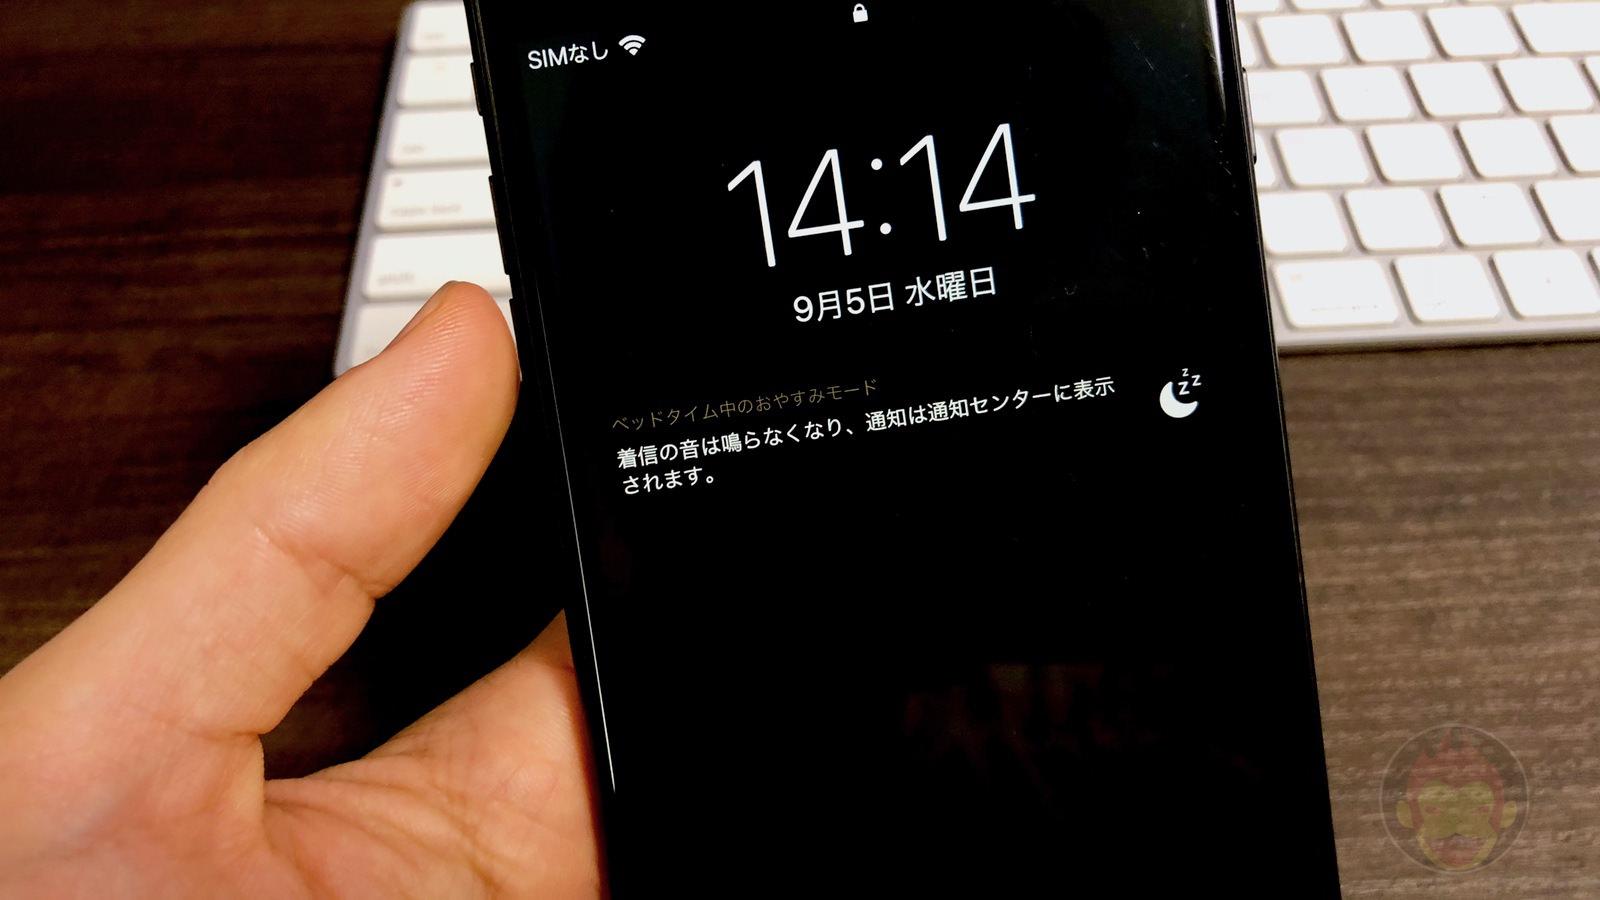 IOS12 Do not disturb mode bedtime iphone 01